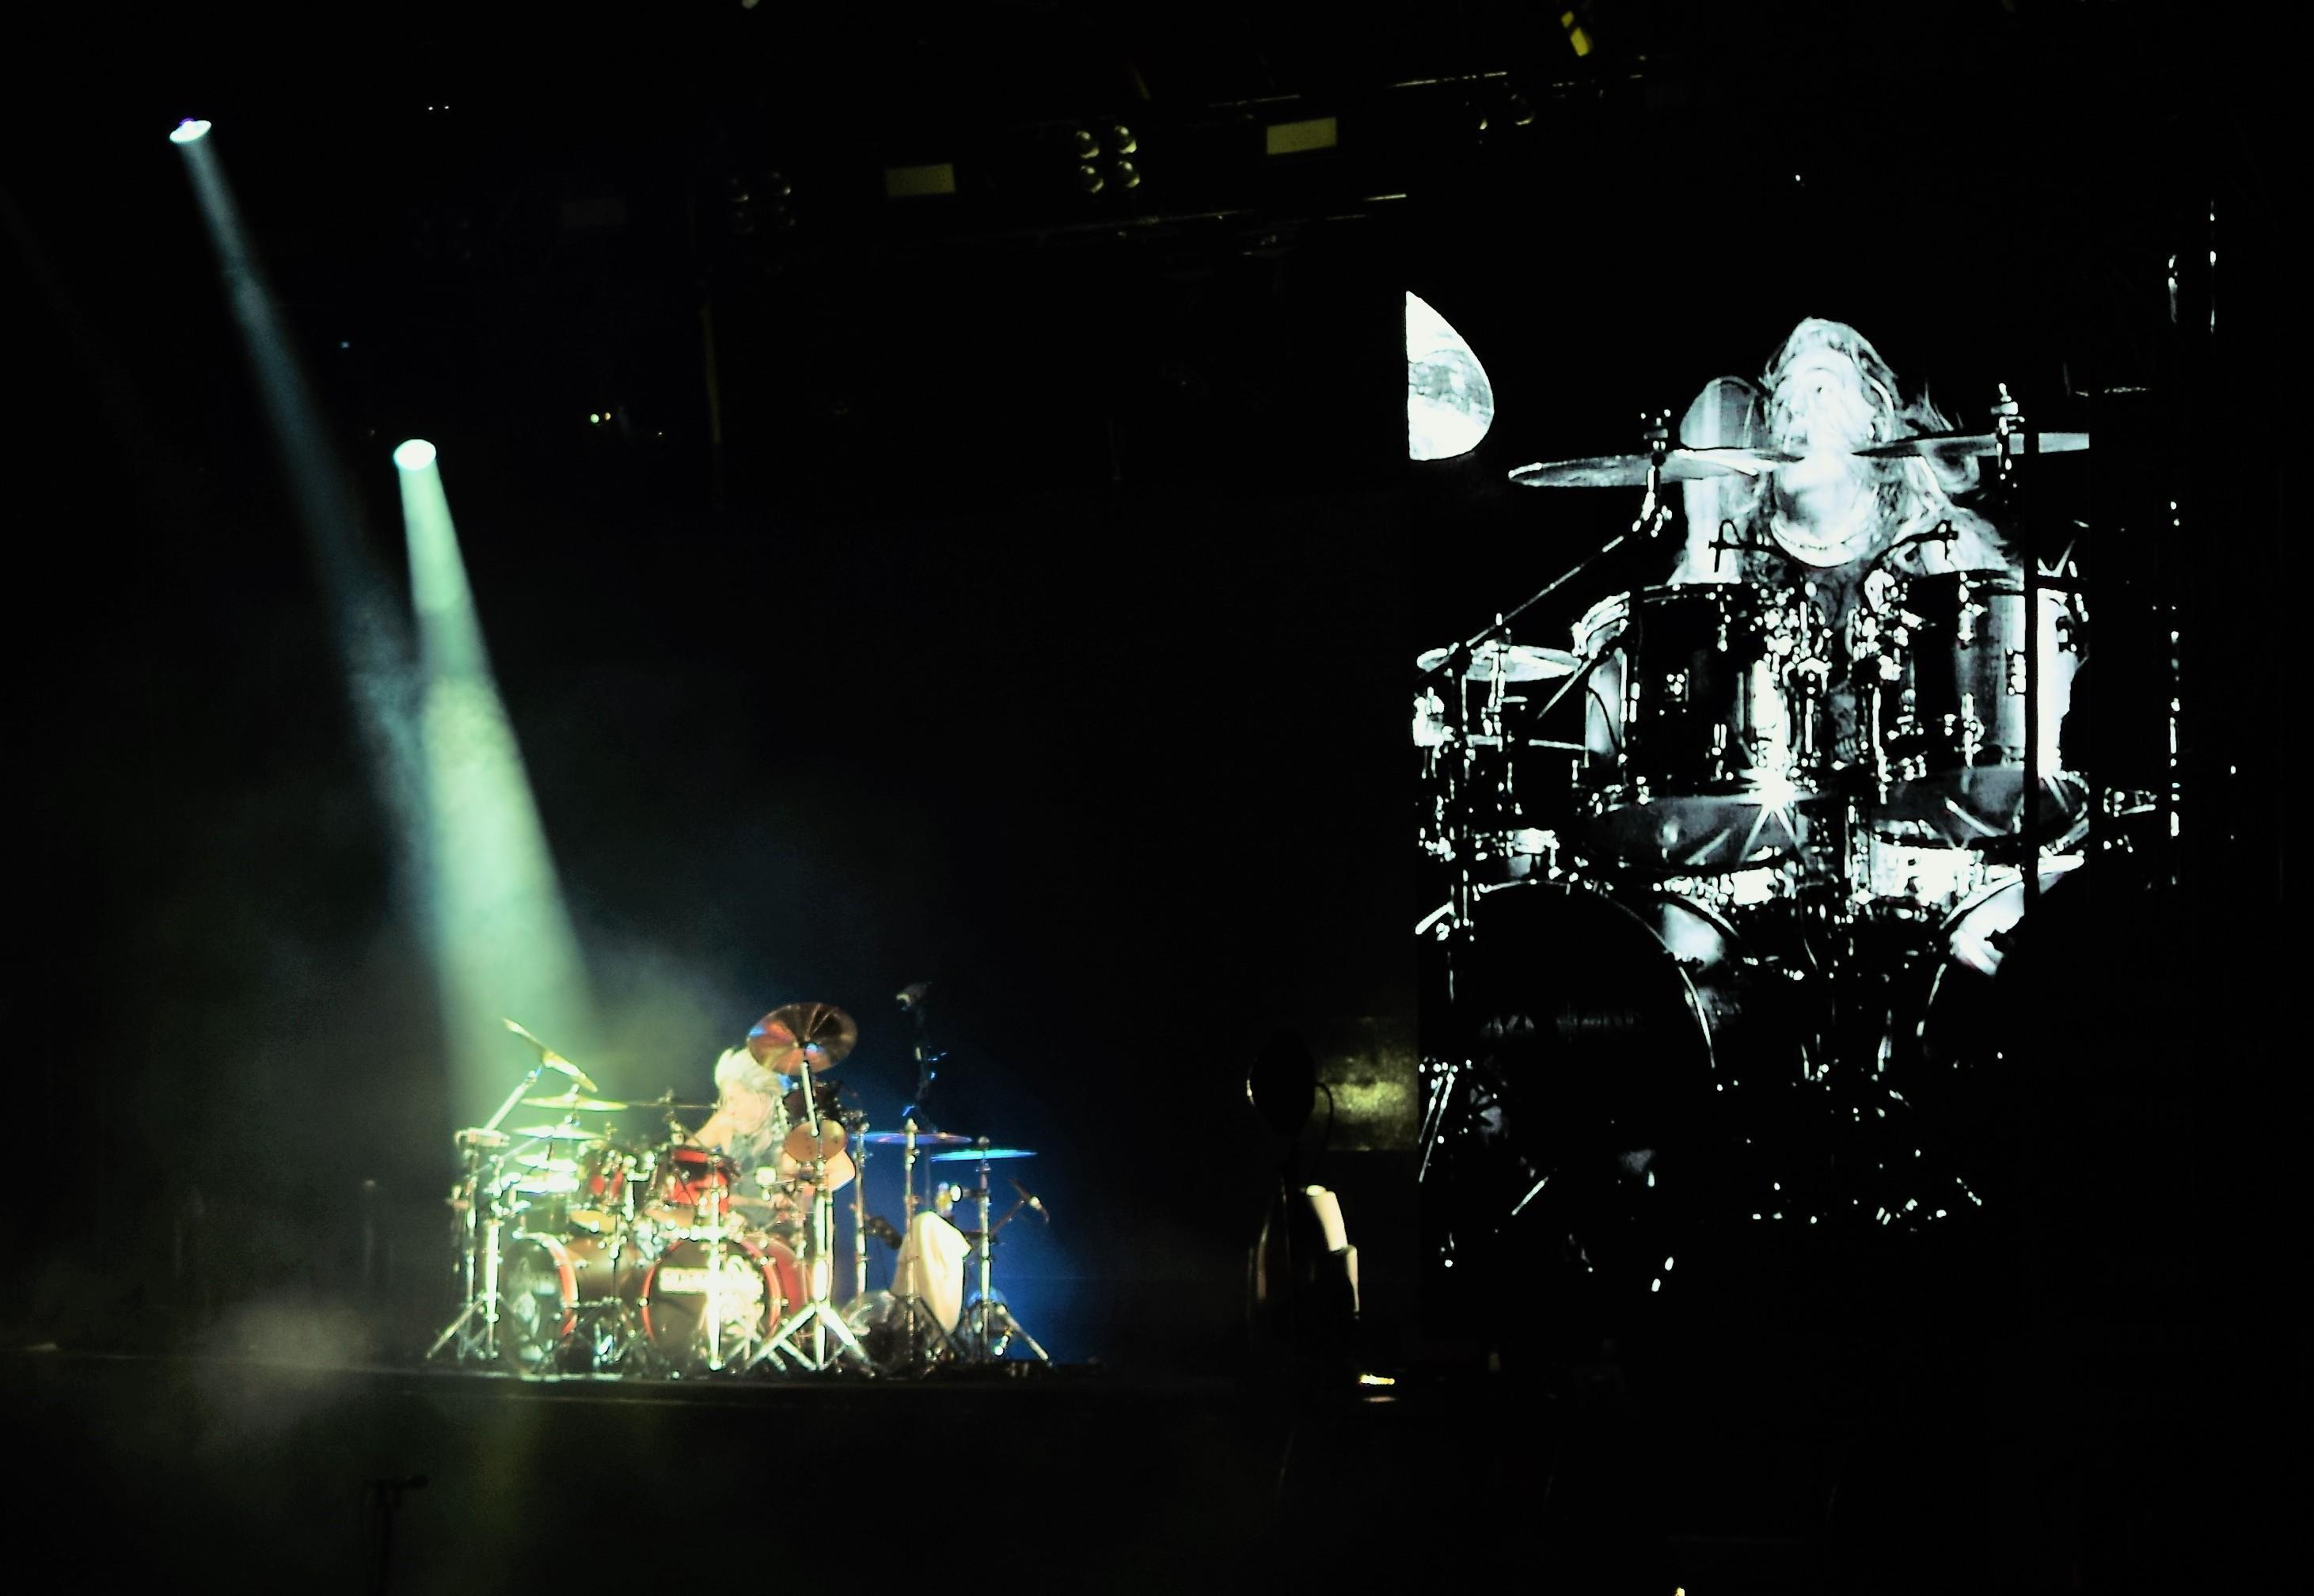 The Scorpions drummer Mikkey Dee performing a solo at Tel Aviv's Menora Mivtachim Arena, July 19 2018 (JULIANE HELMHOLD)